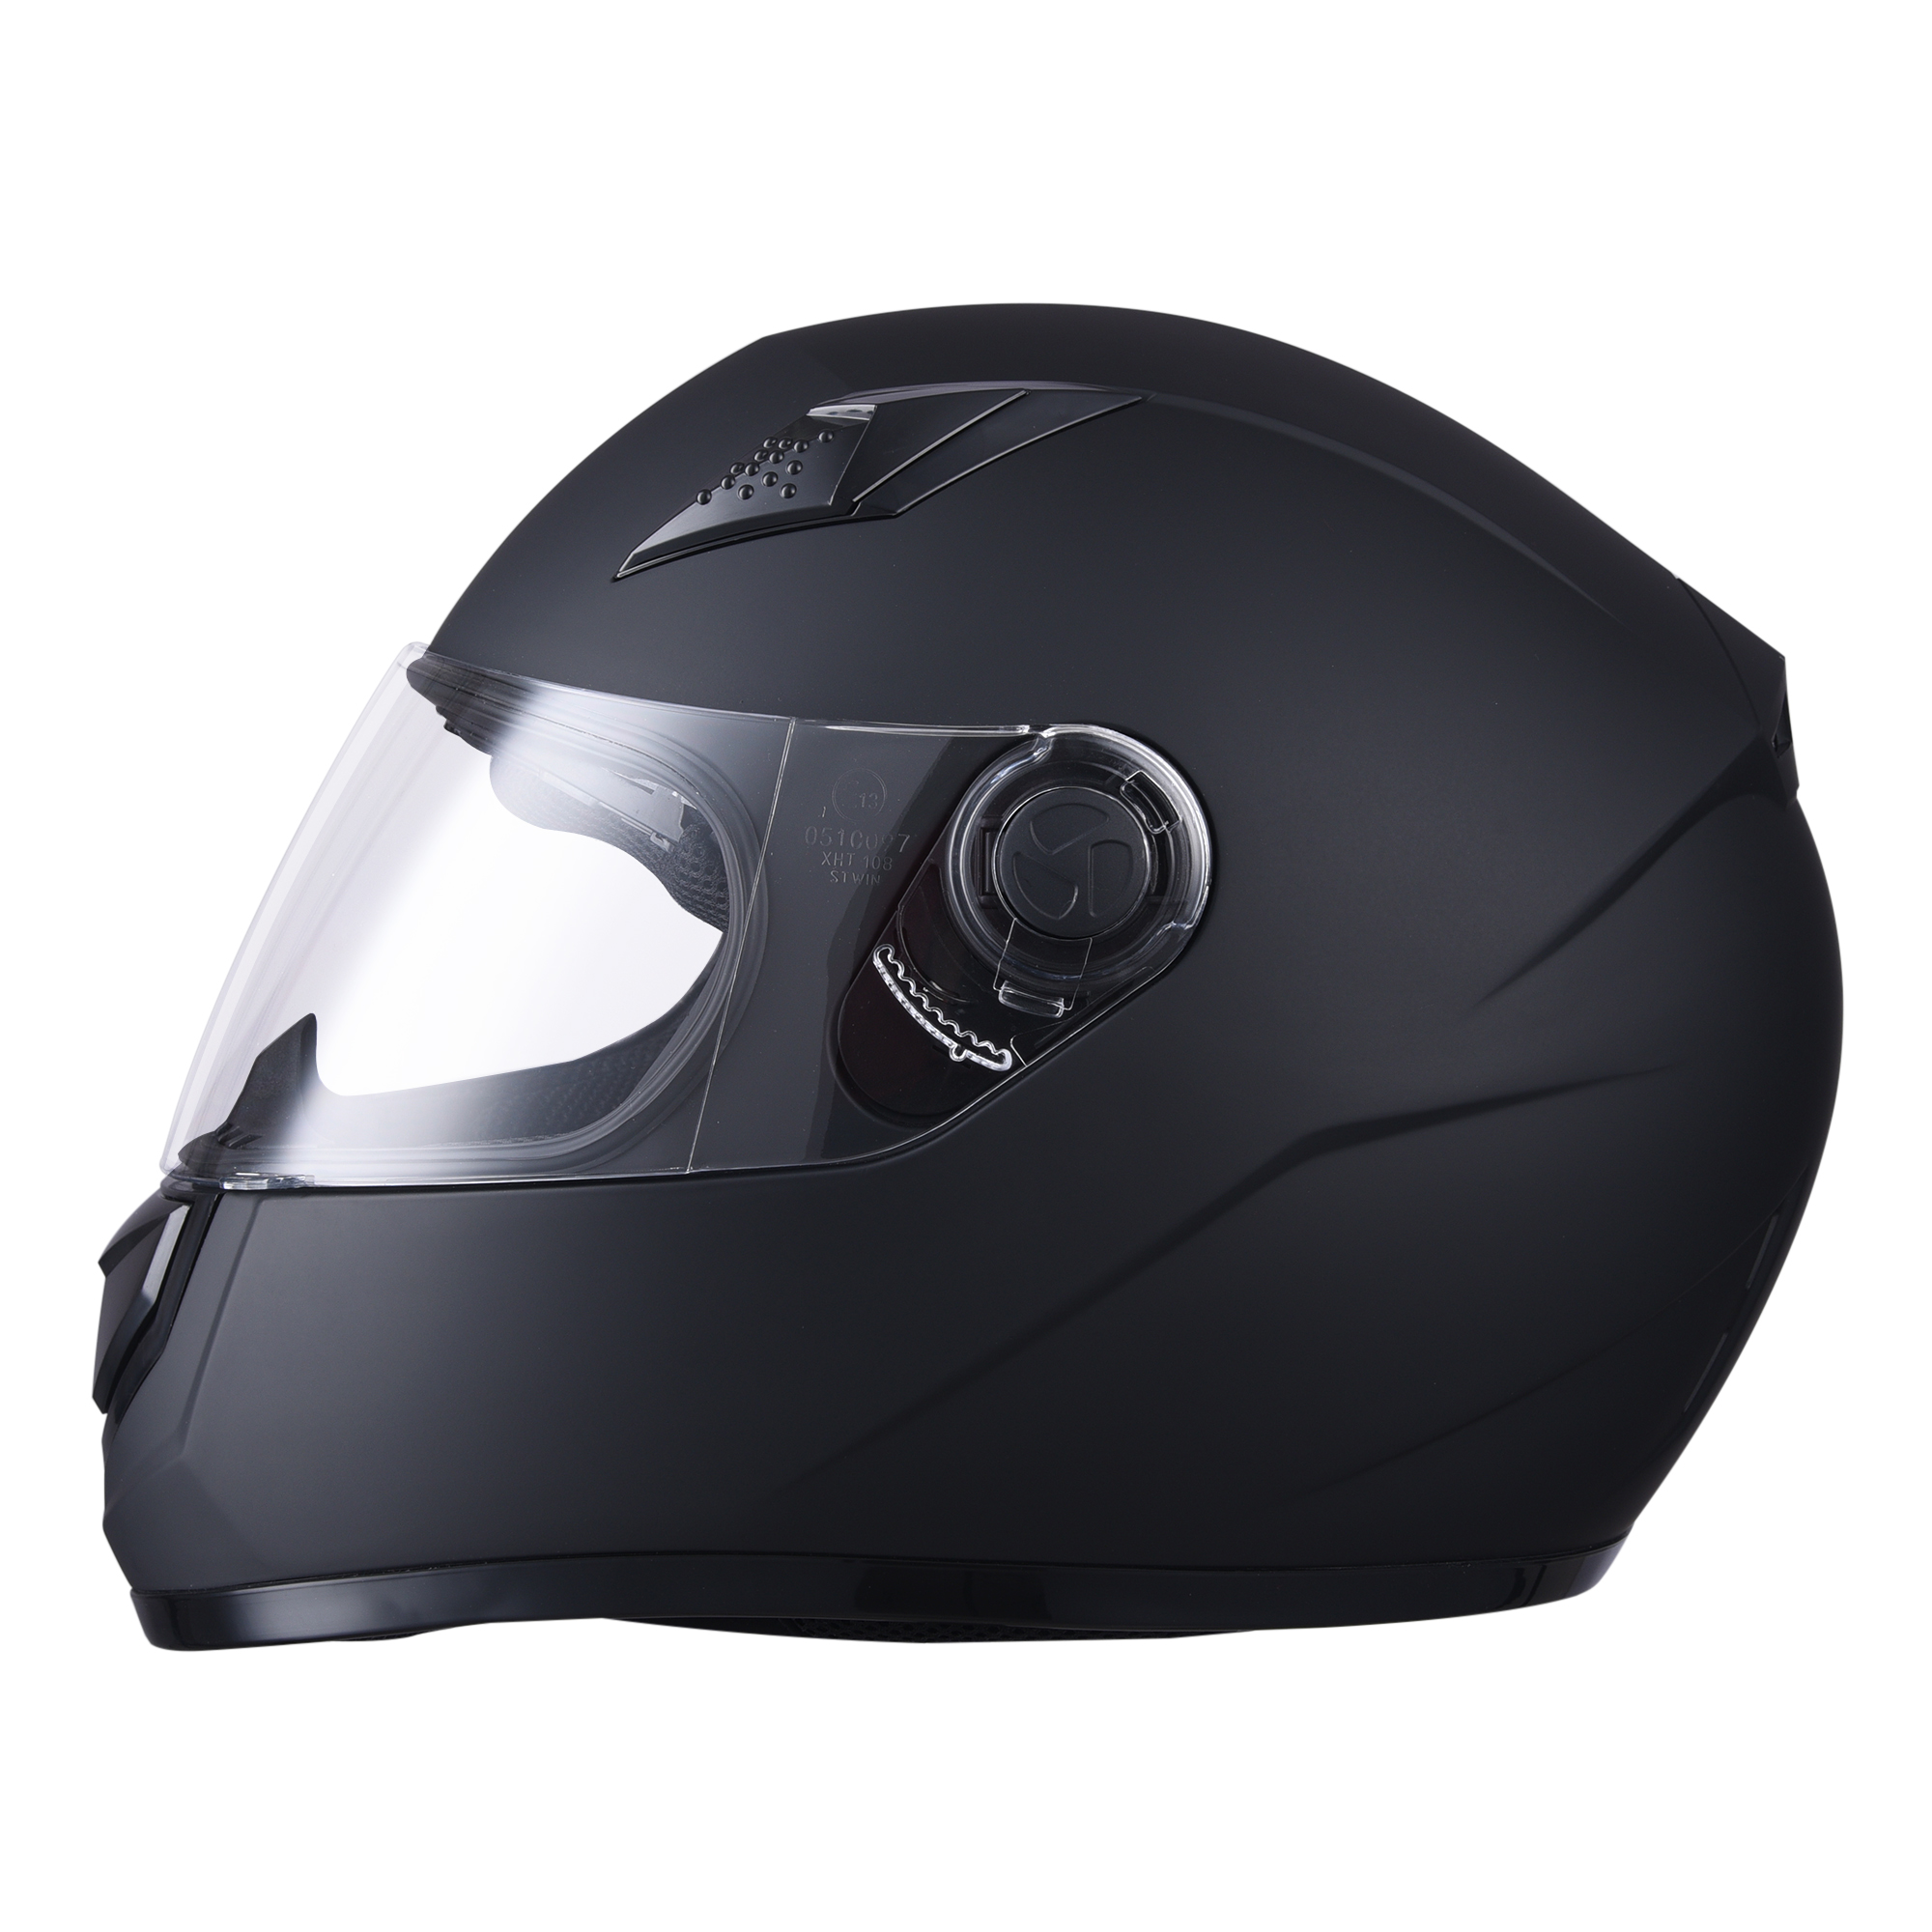 miniature 27 - AHR K12 Full Face Motorcycle Helmet DOT Air Vents Clear Visor Racing S M L XL